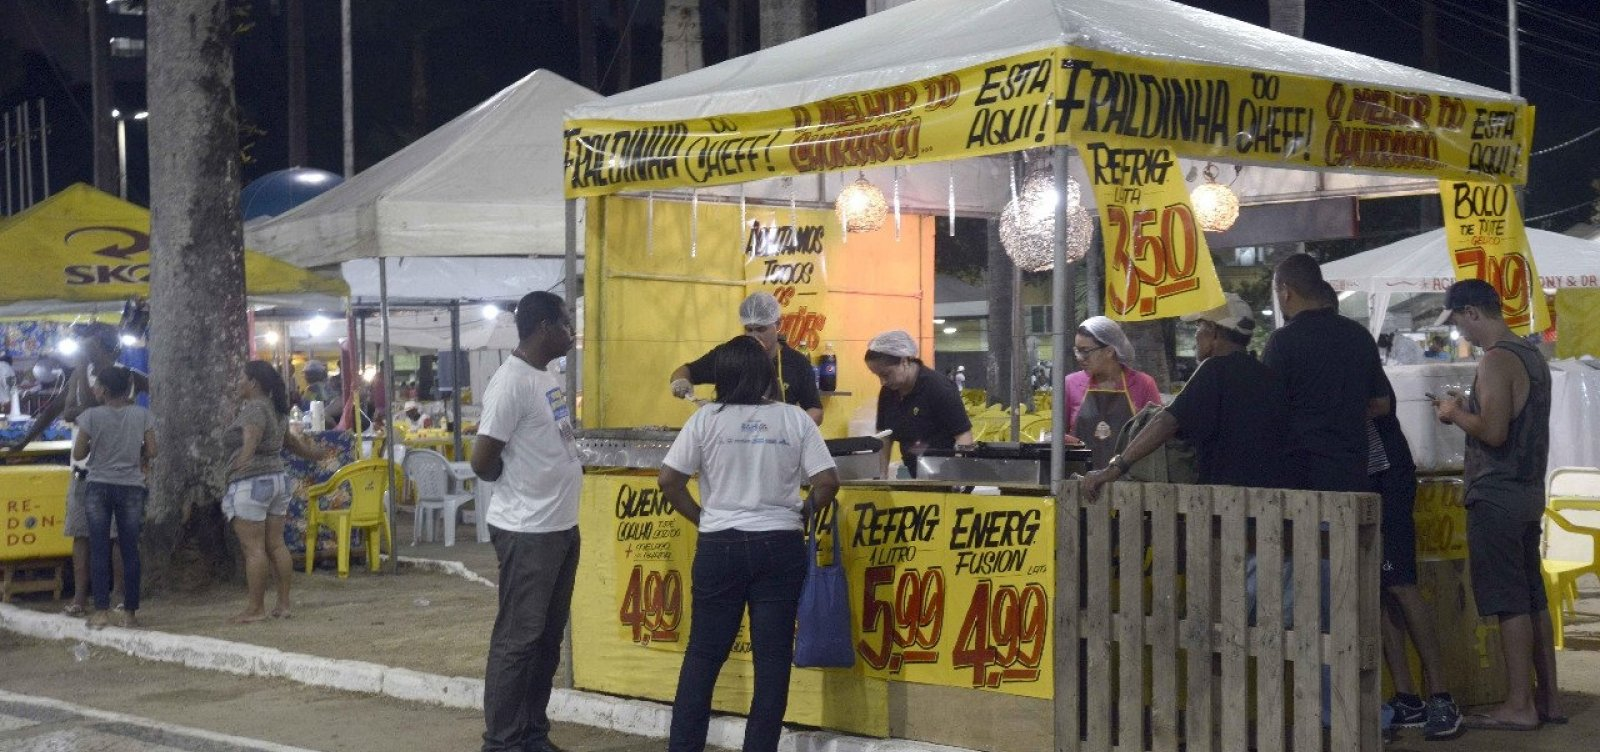 Prefeitura inicia reordenamento docomércio informal no Centro Histórico